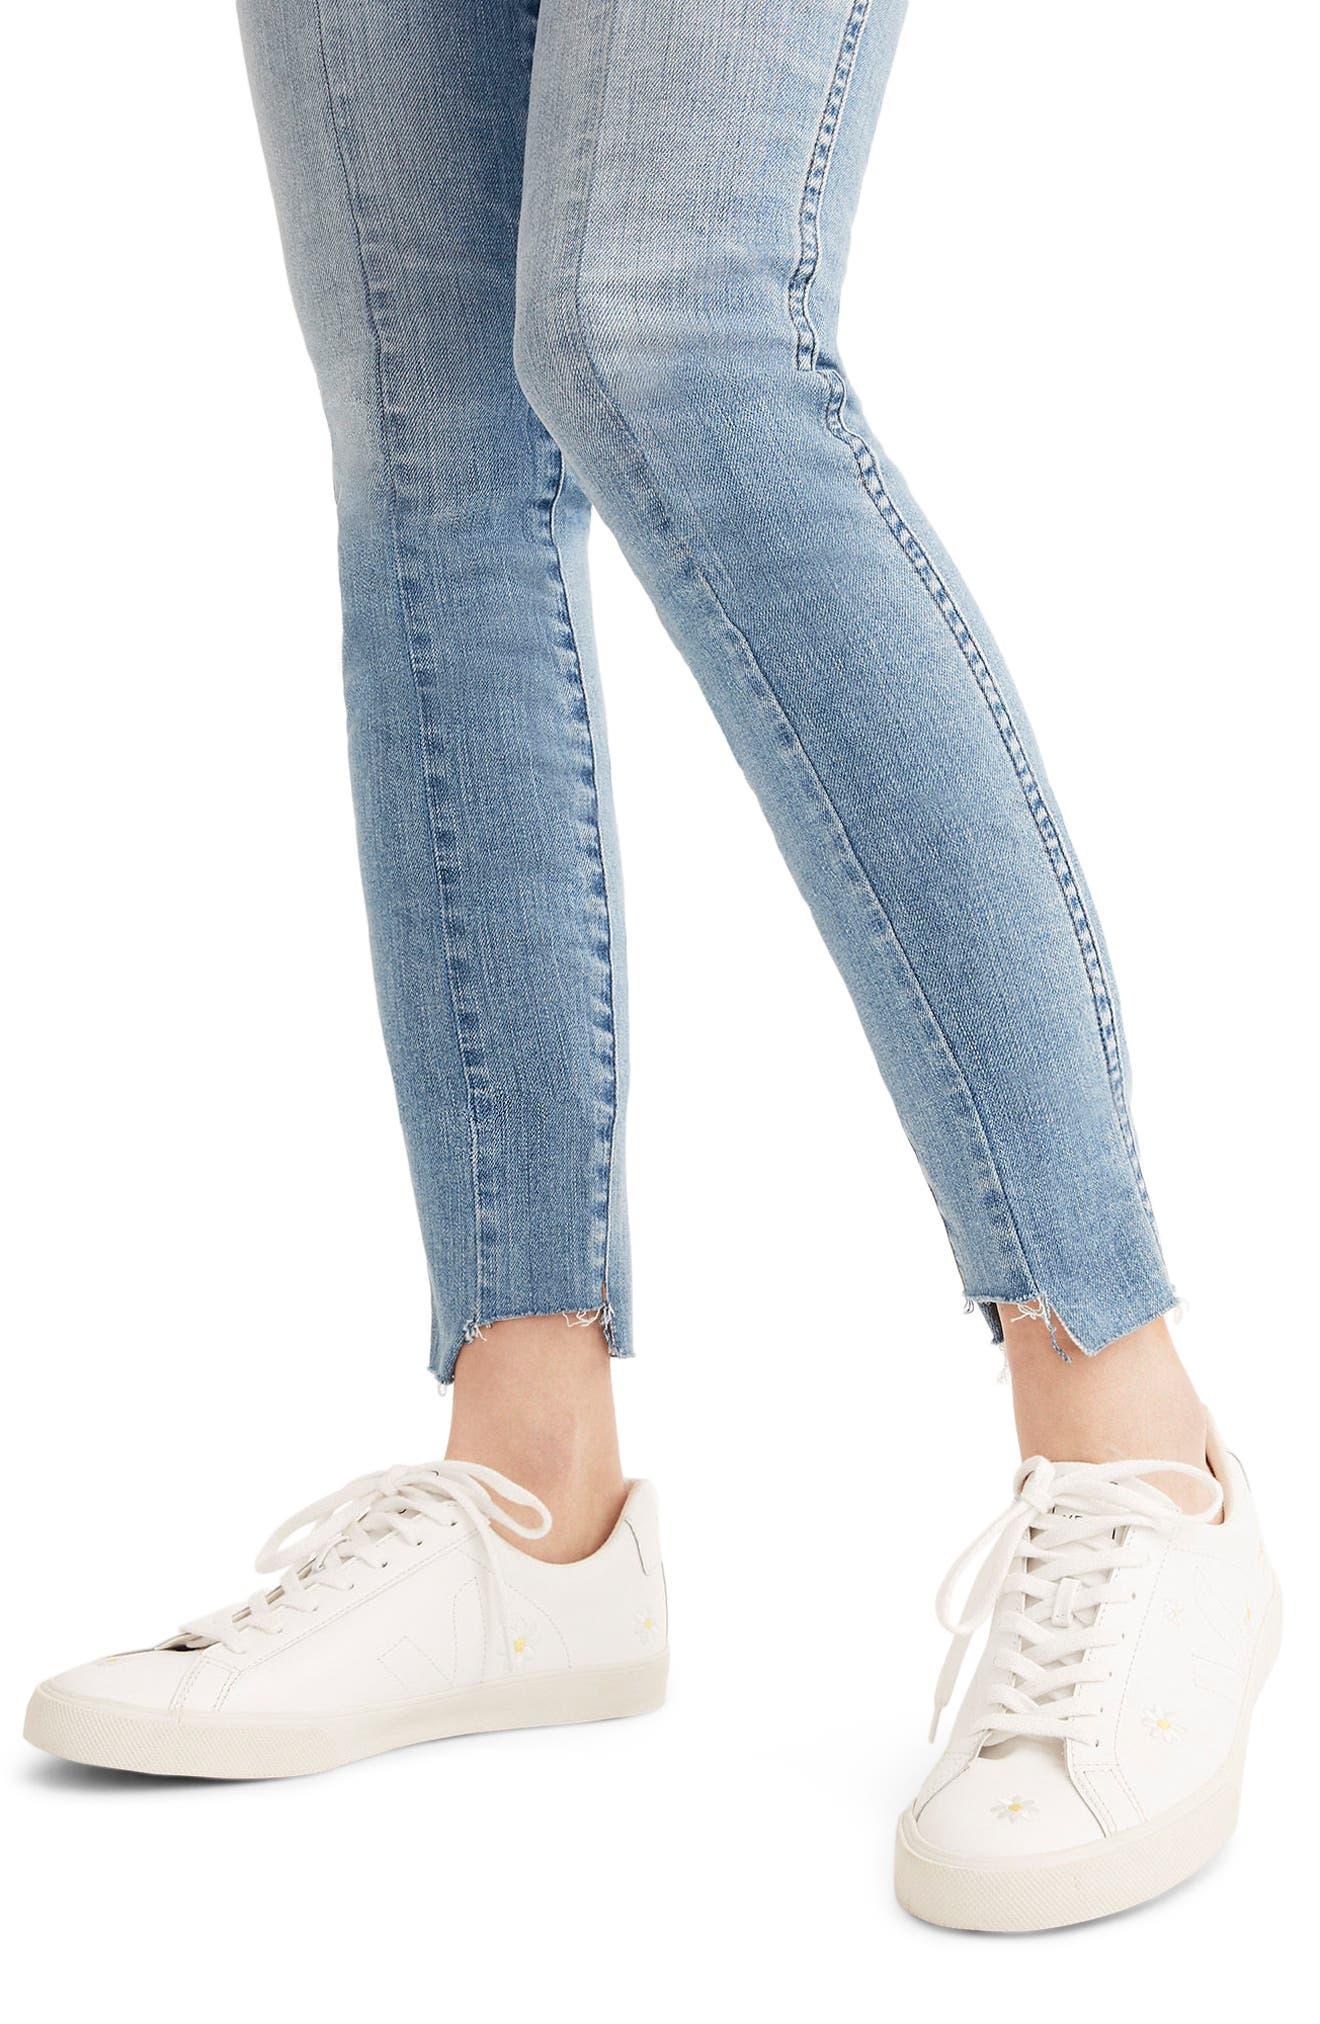 MADEWELL, 9-Inch High Waist Seamed Step-Hem Edition Skinny Jeans, Alternate thumbnail 5, color, 400